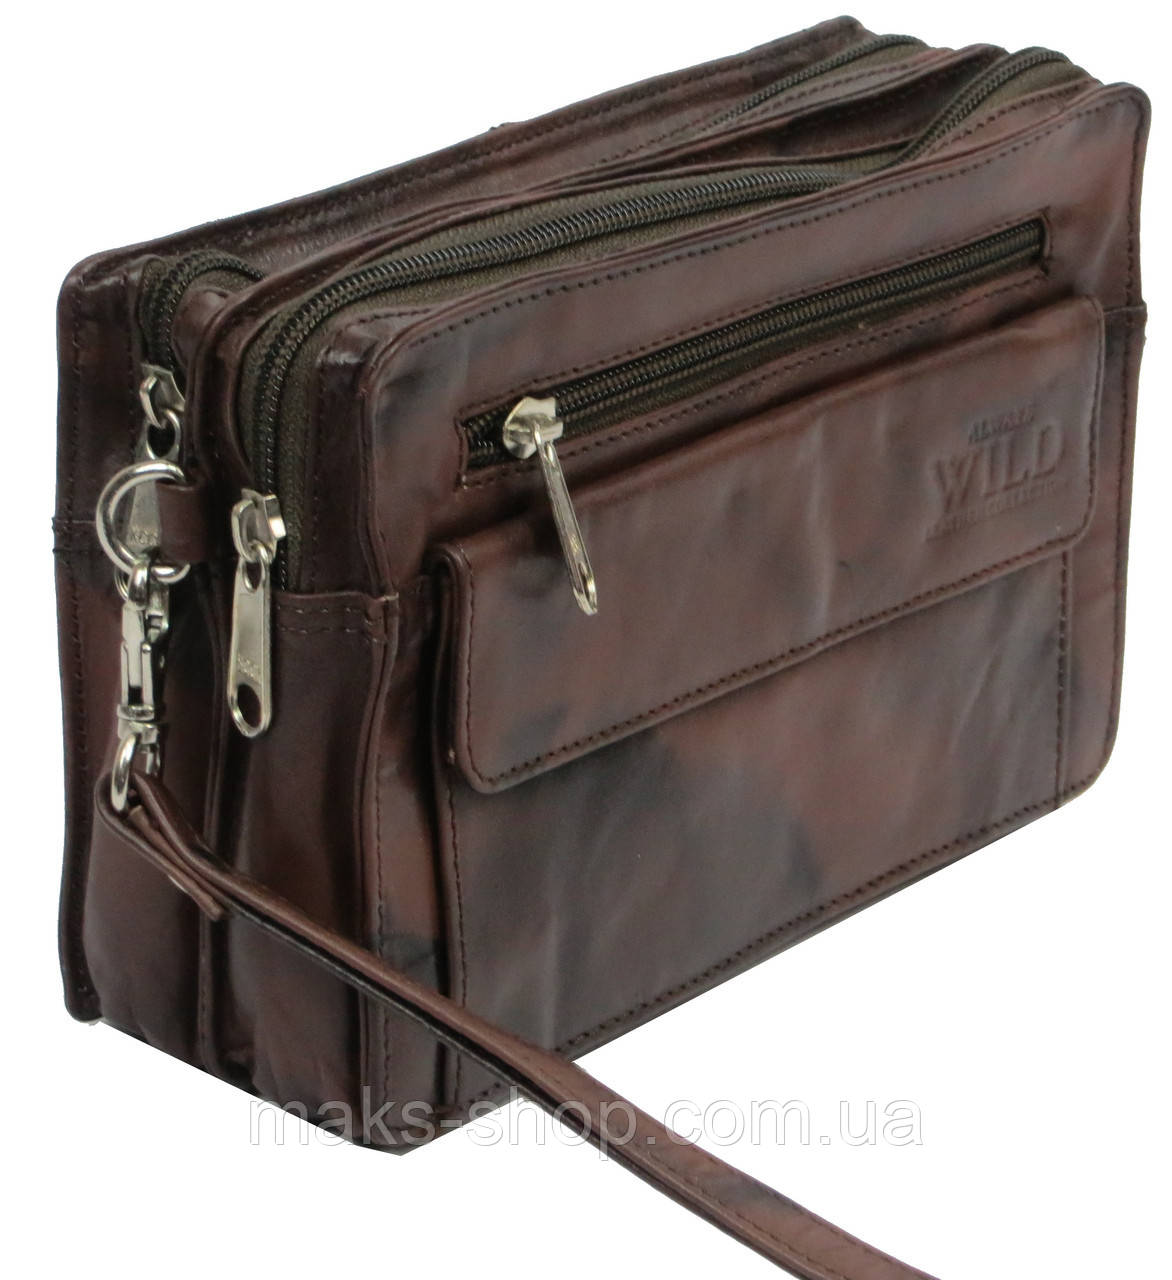 1fd15f1cd7a0 Мужская сумка-барсетка кожаная Always Wild 903-TT коричневый - Maks Shop-  надежный